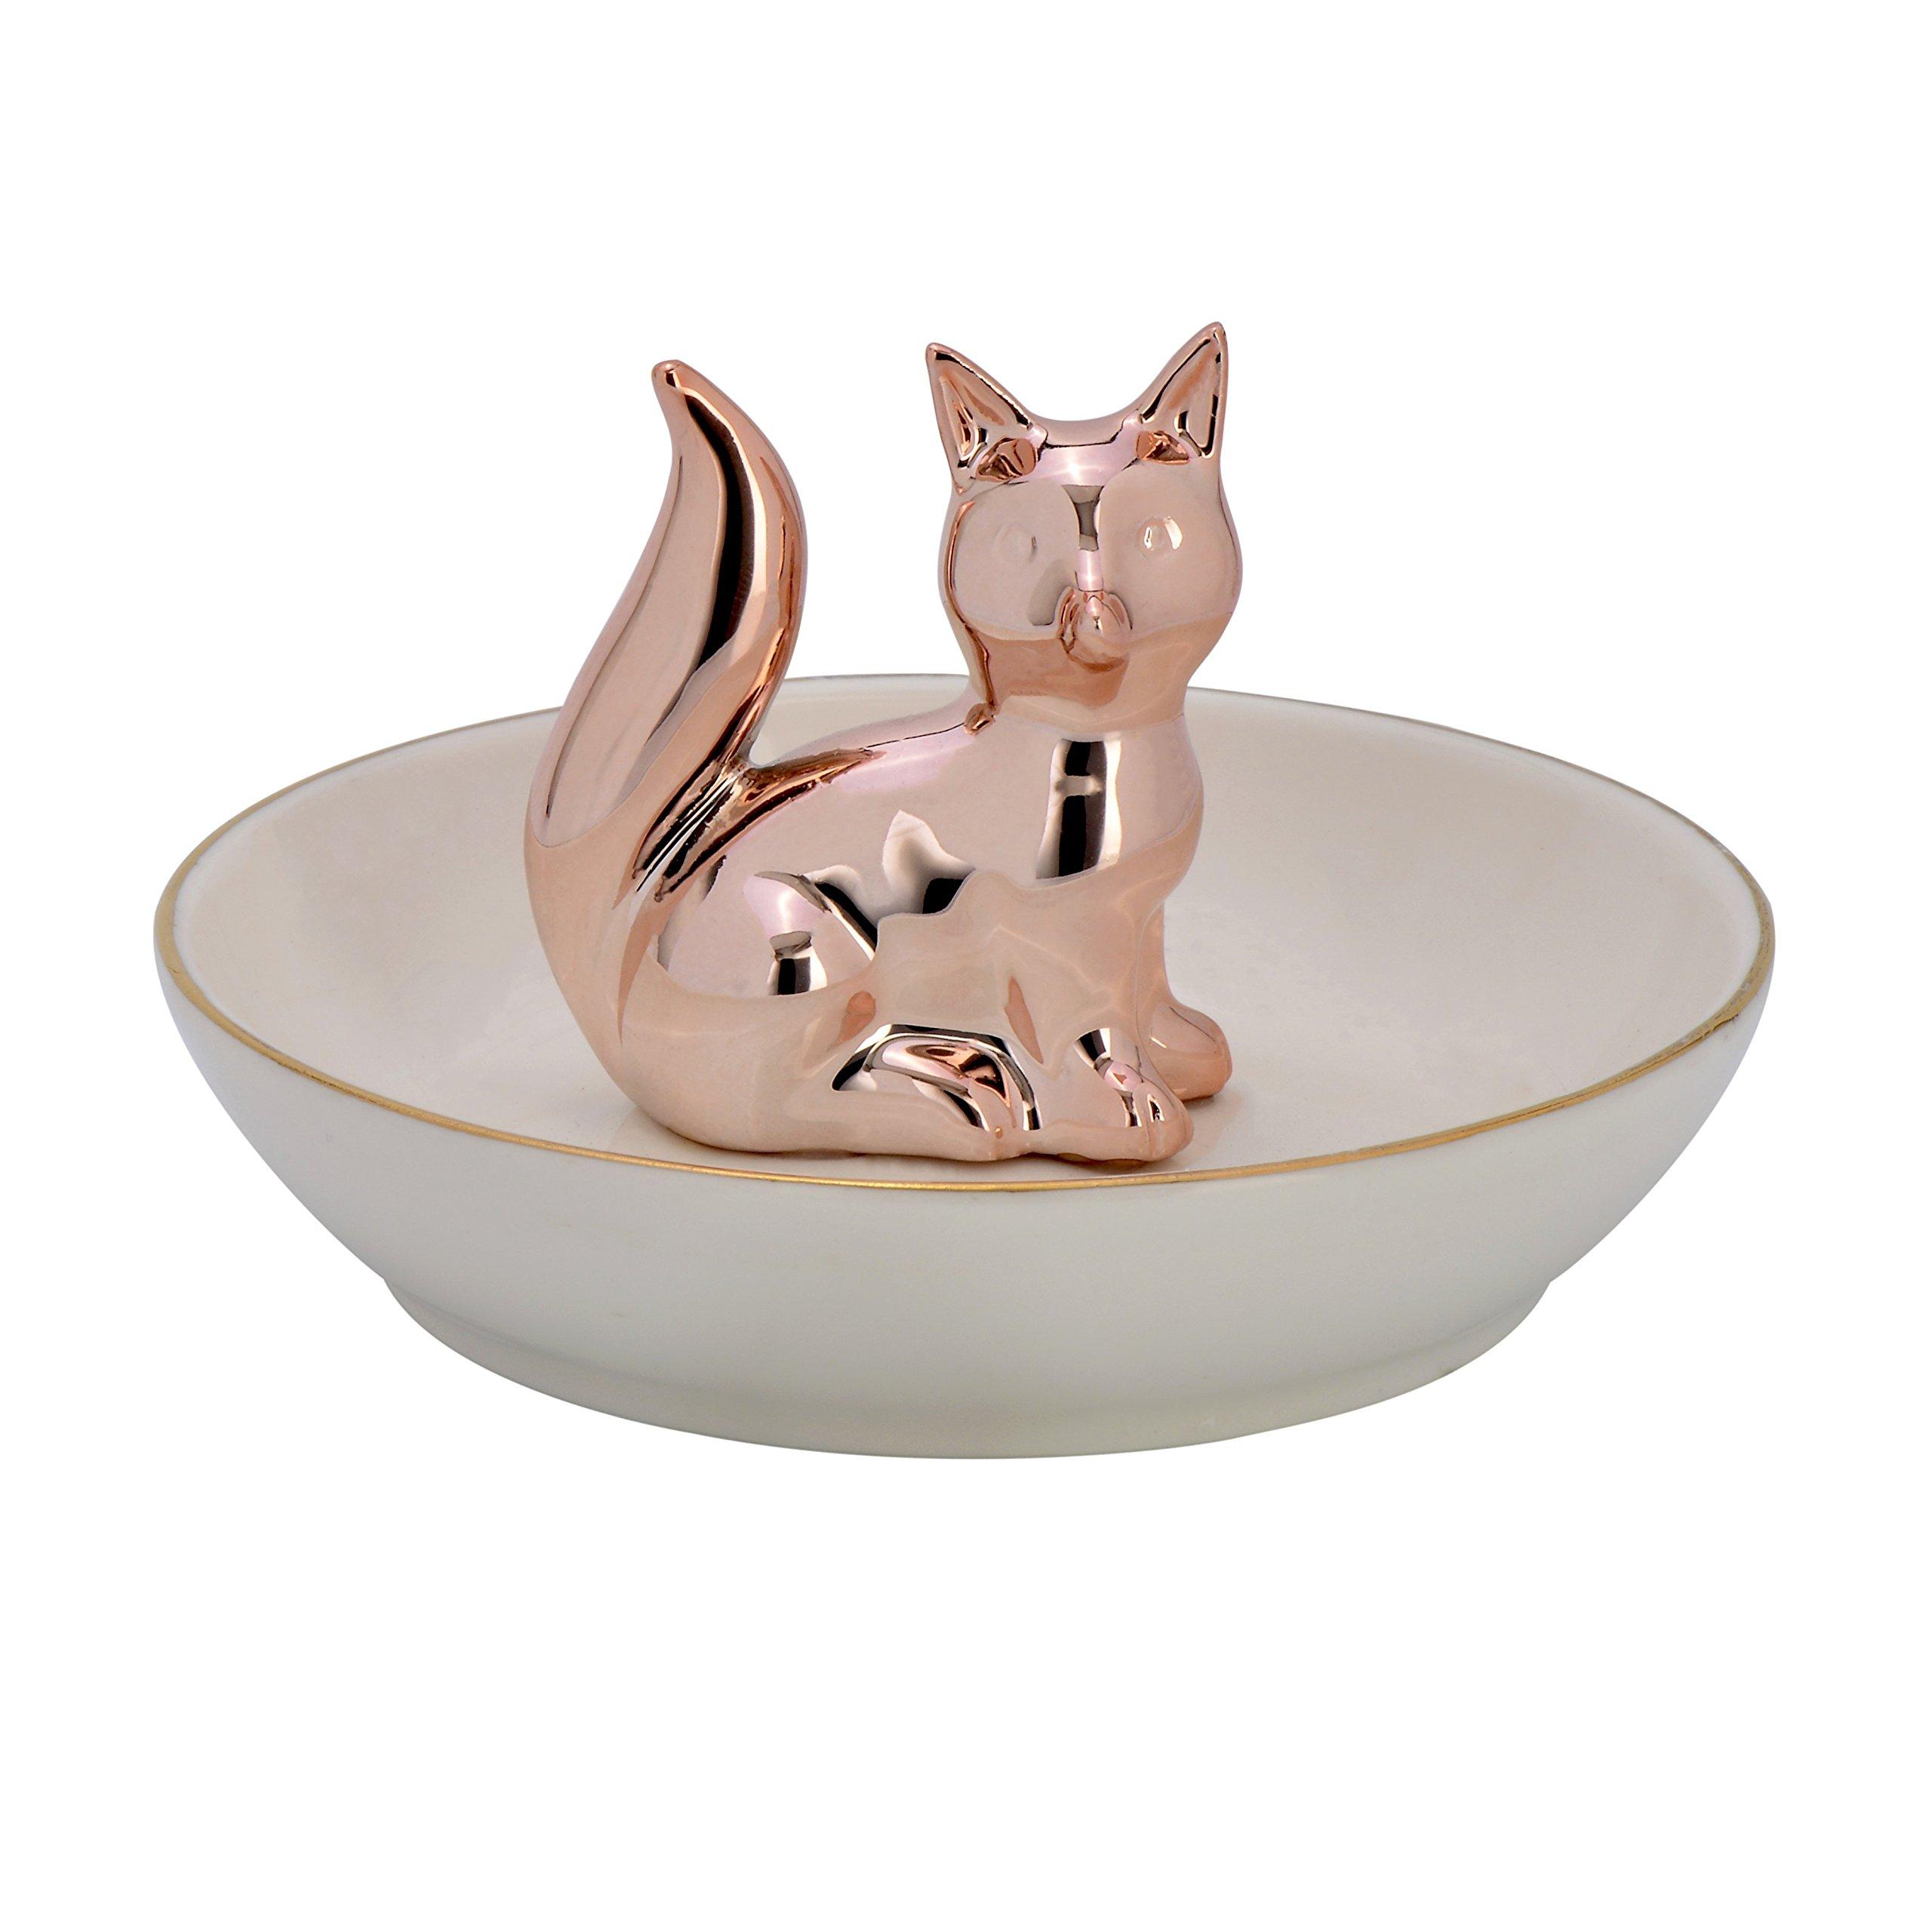 Fox Ring Holder Ceramic Ring Dish Jewelry Trinket Dish Jewelry Holder Plate Stand (Rose Gold)